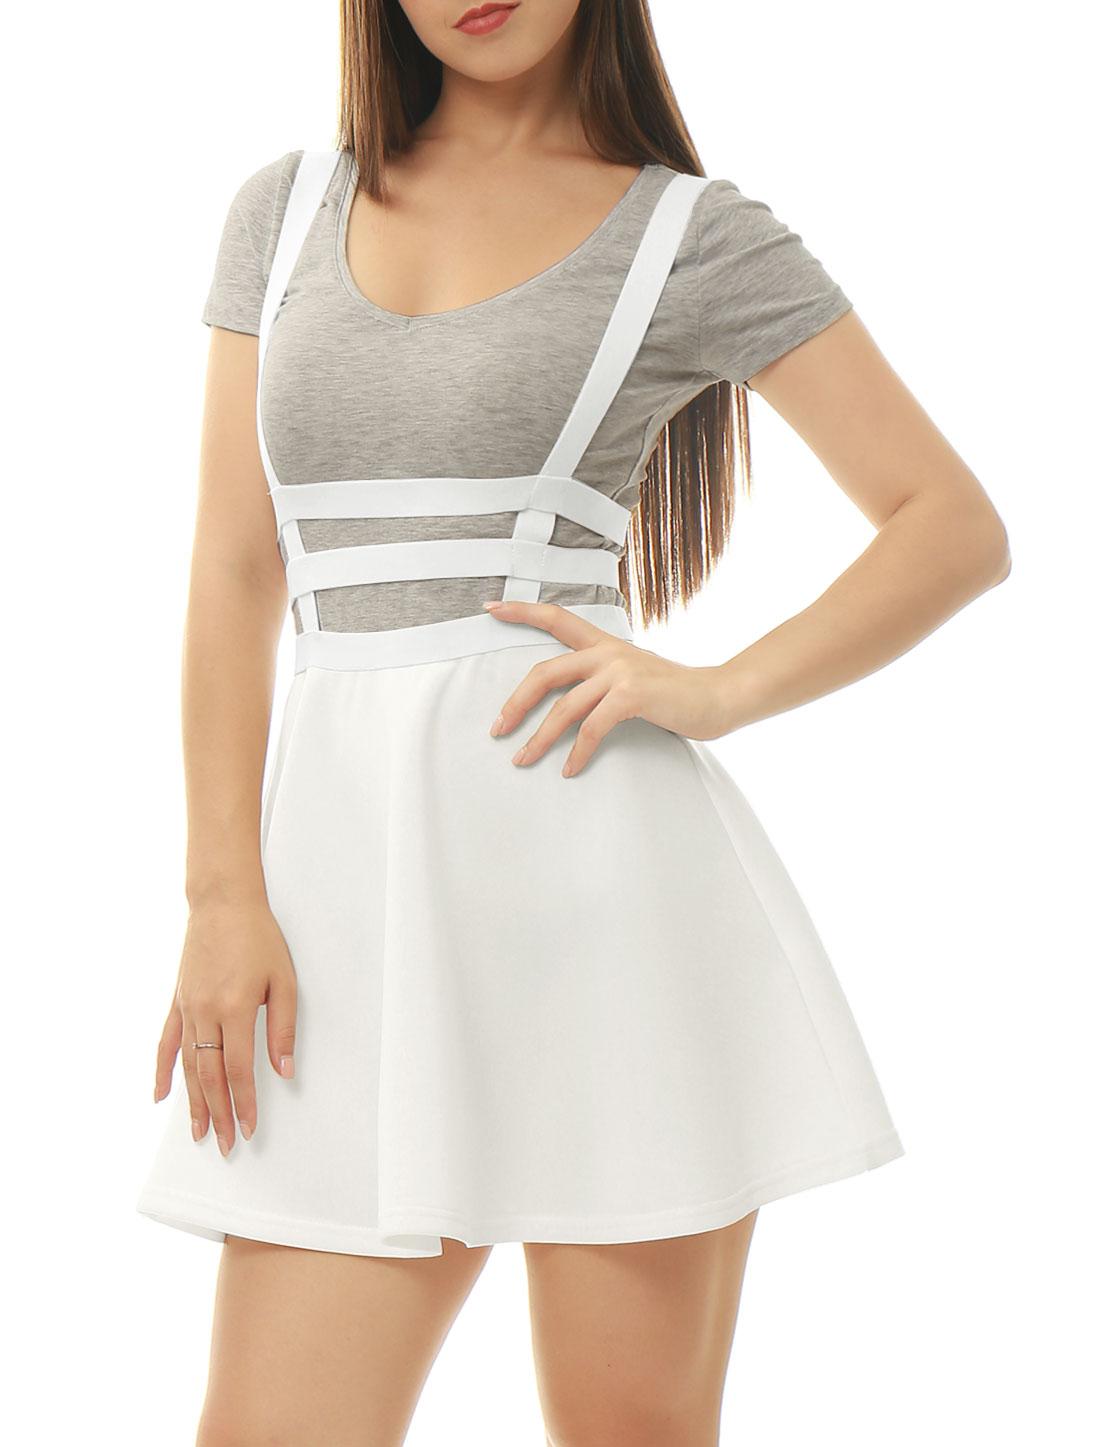 Allegra K Women Elastic Waist Cut Out A Line Suspender Skirt White L